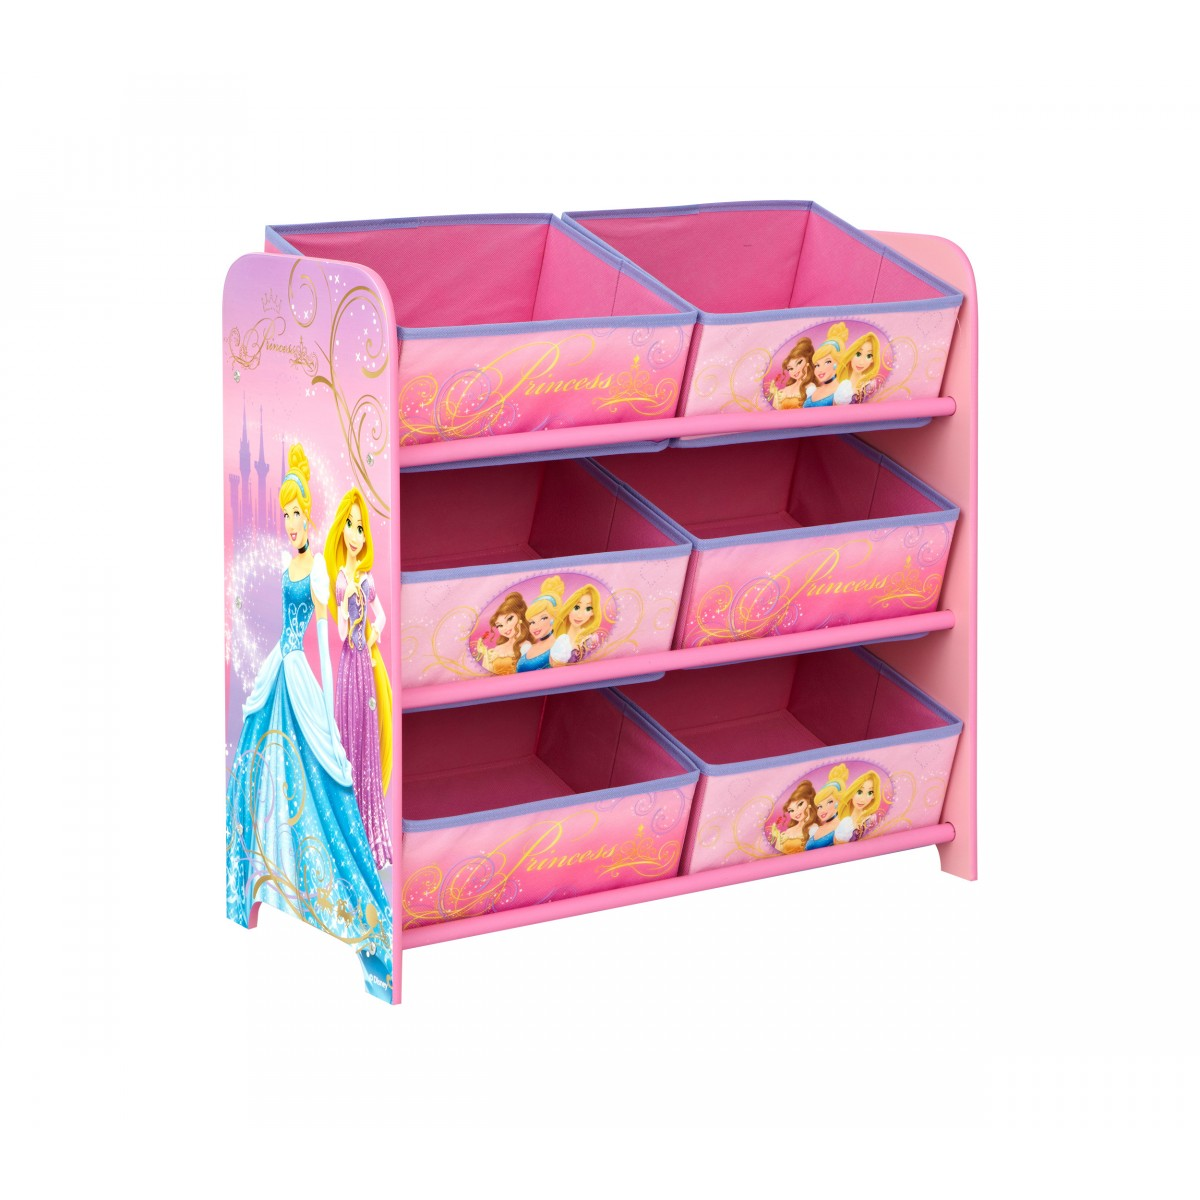 someo soldes rangement 3 tag res et 6 paniers princess. Black Bedroom Furniture Sets. Home Design Ideas